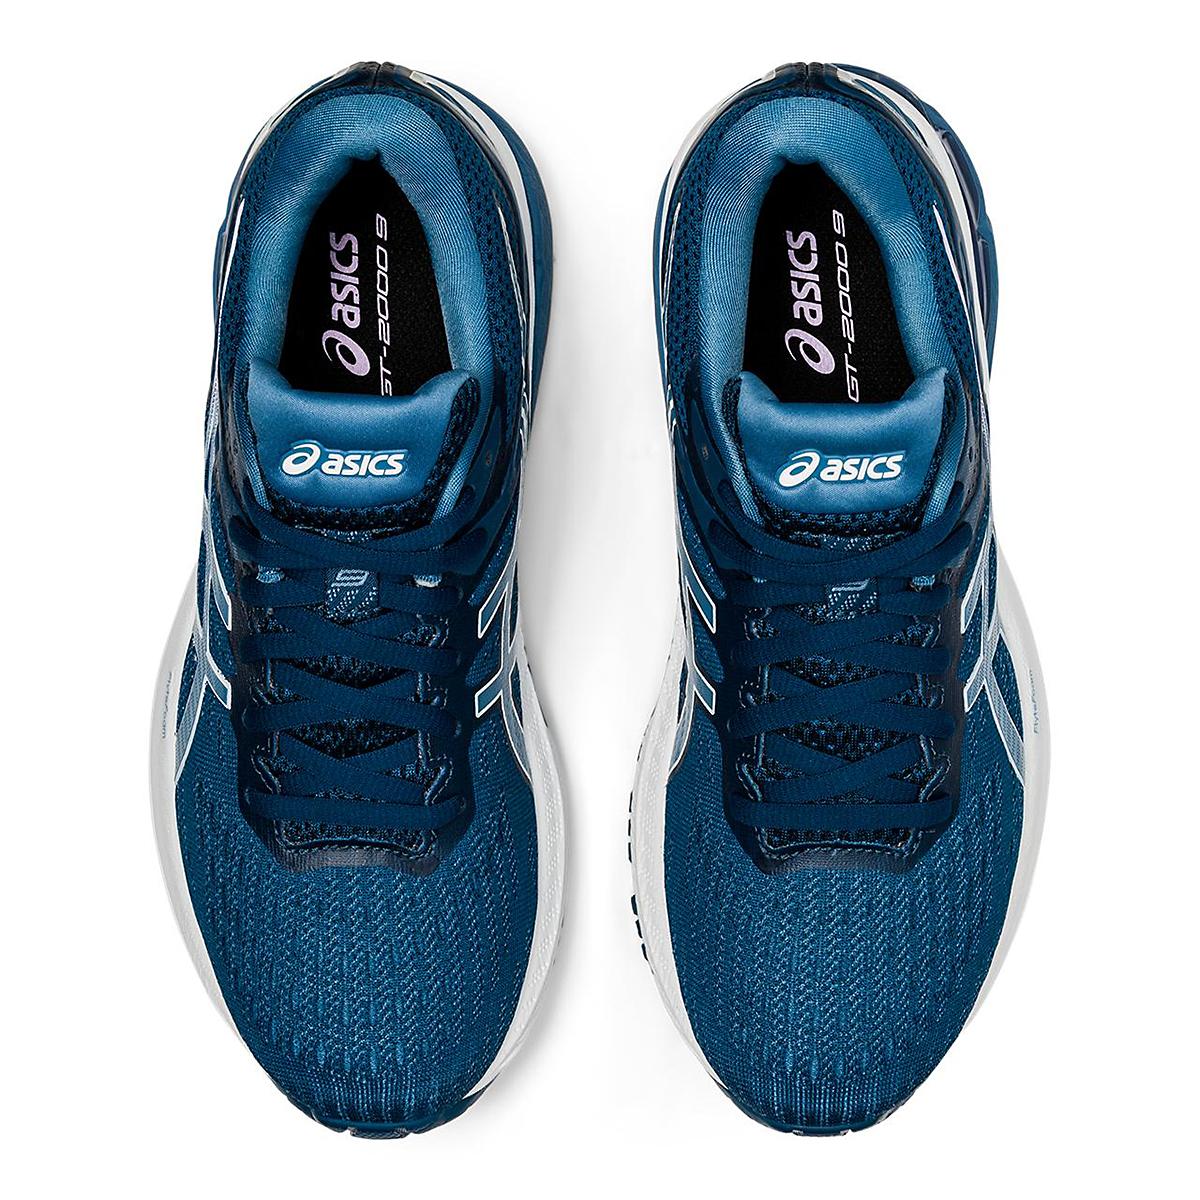 Women's Asics Gt-2000 9 Running Shoe - Color: Mako Blue/Grey Floss - Size: 5 - Width: Regular, Mako Blue/Grey Floss, large, image 3